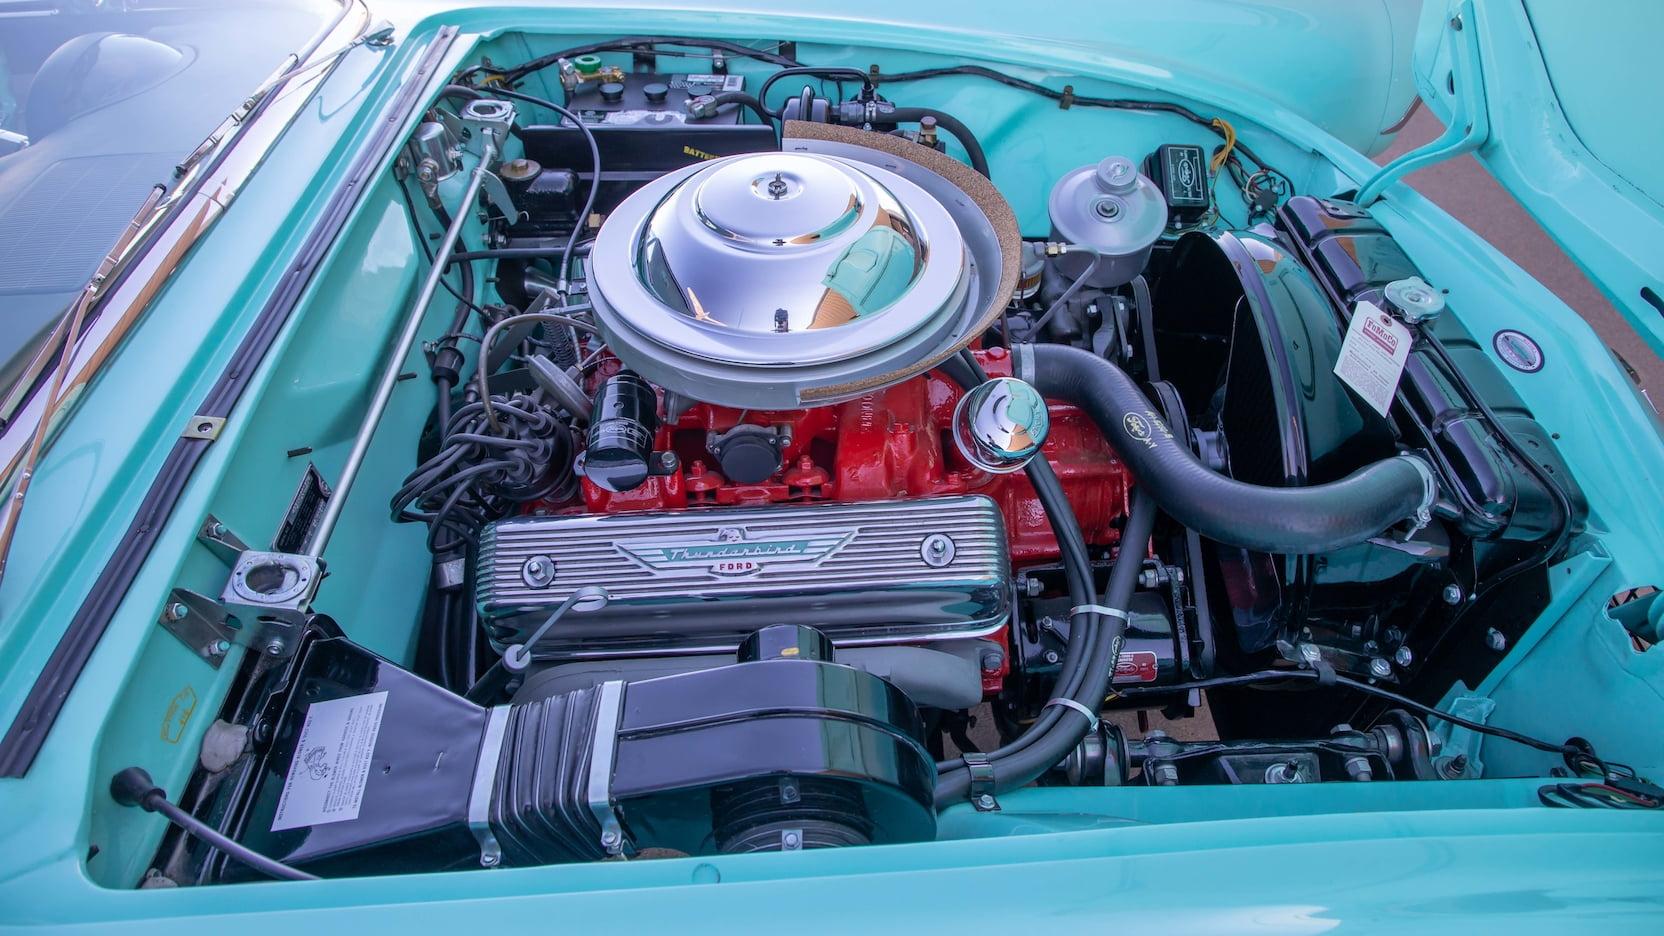 1955 Ford Thunderbird Y-block engine